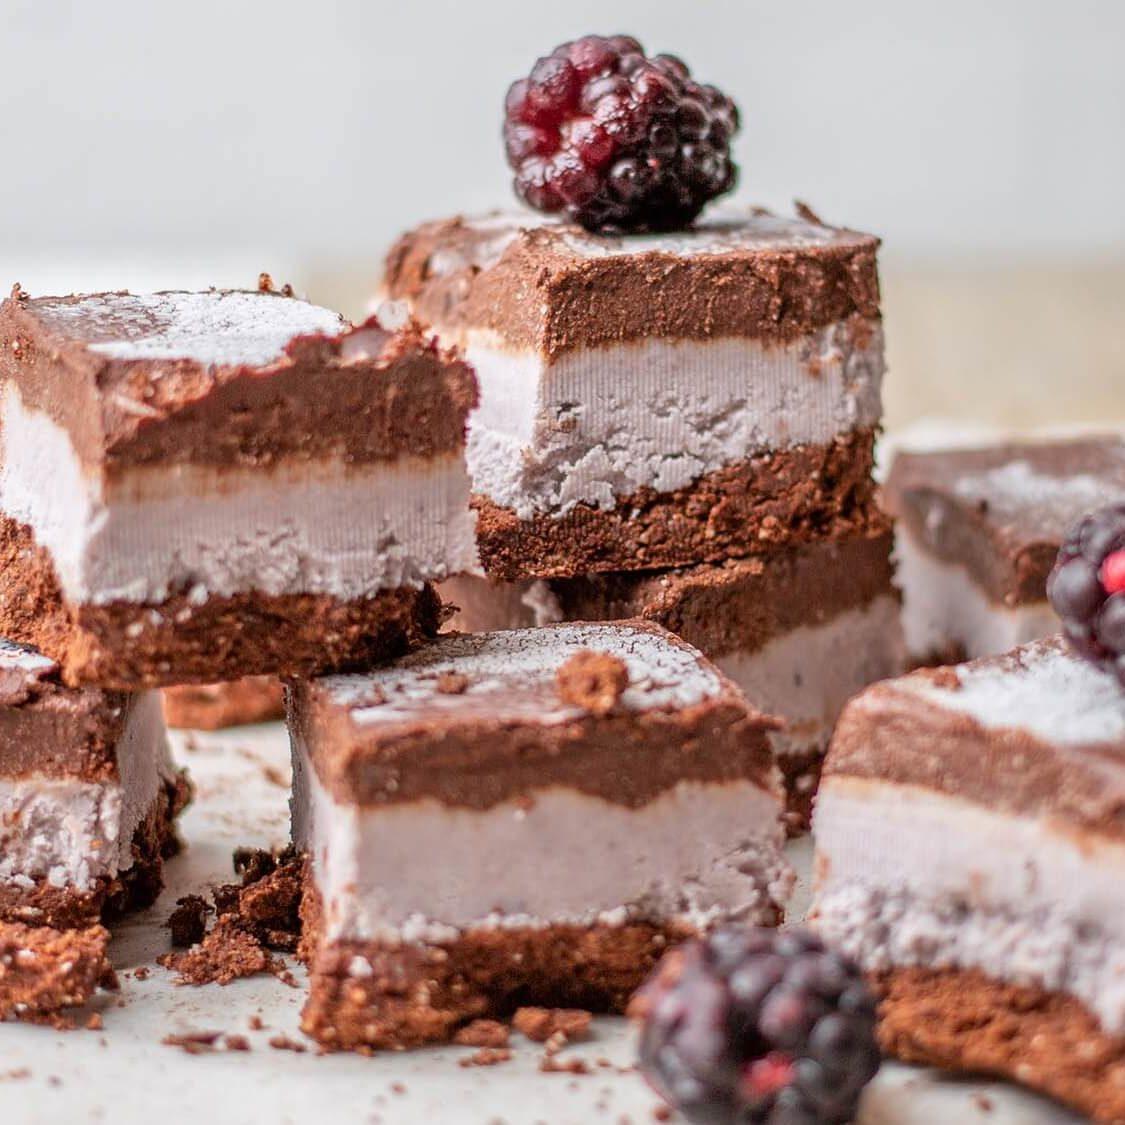 How to Make Dairy-Free Chocolate-Blackberry Ice Cream Sandwiches